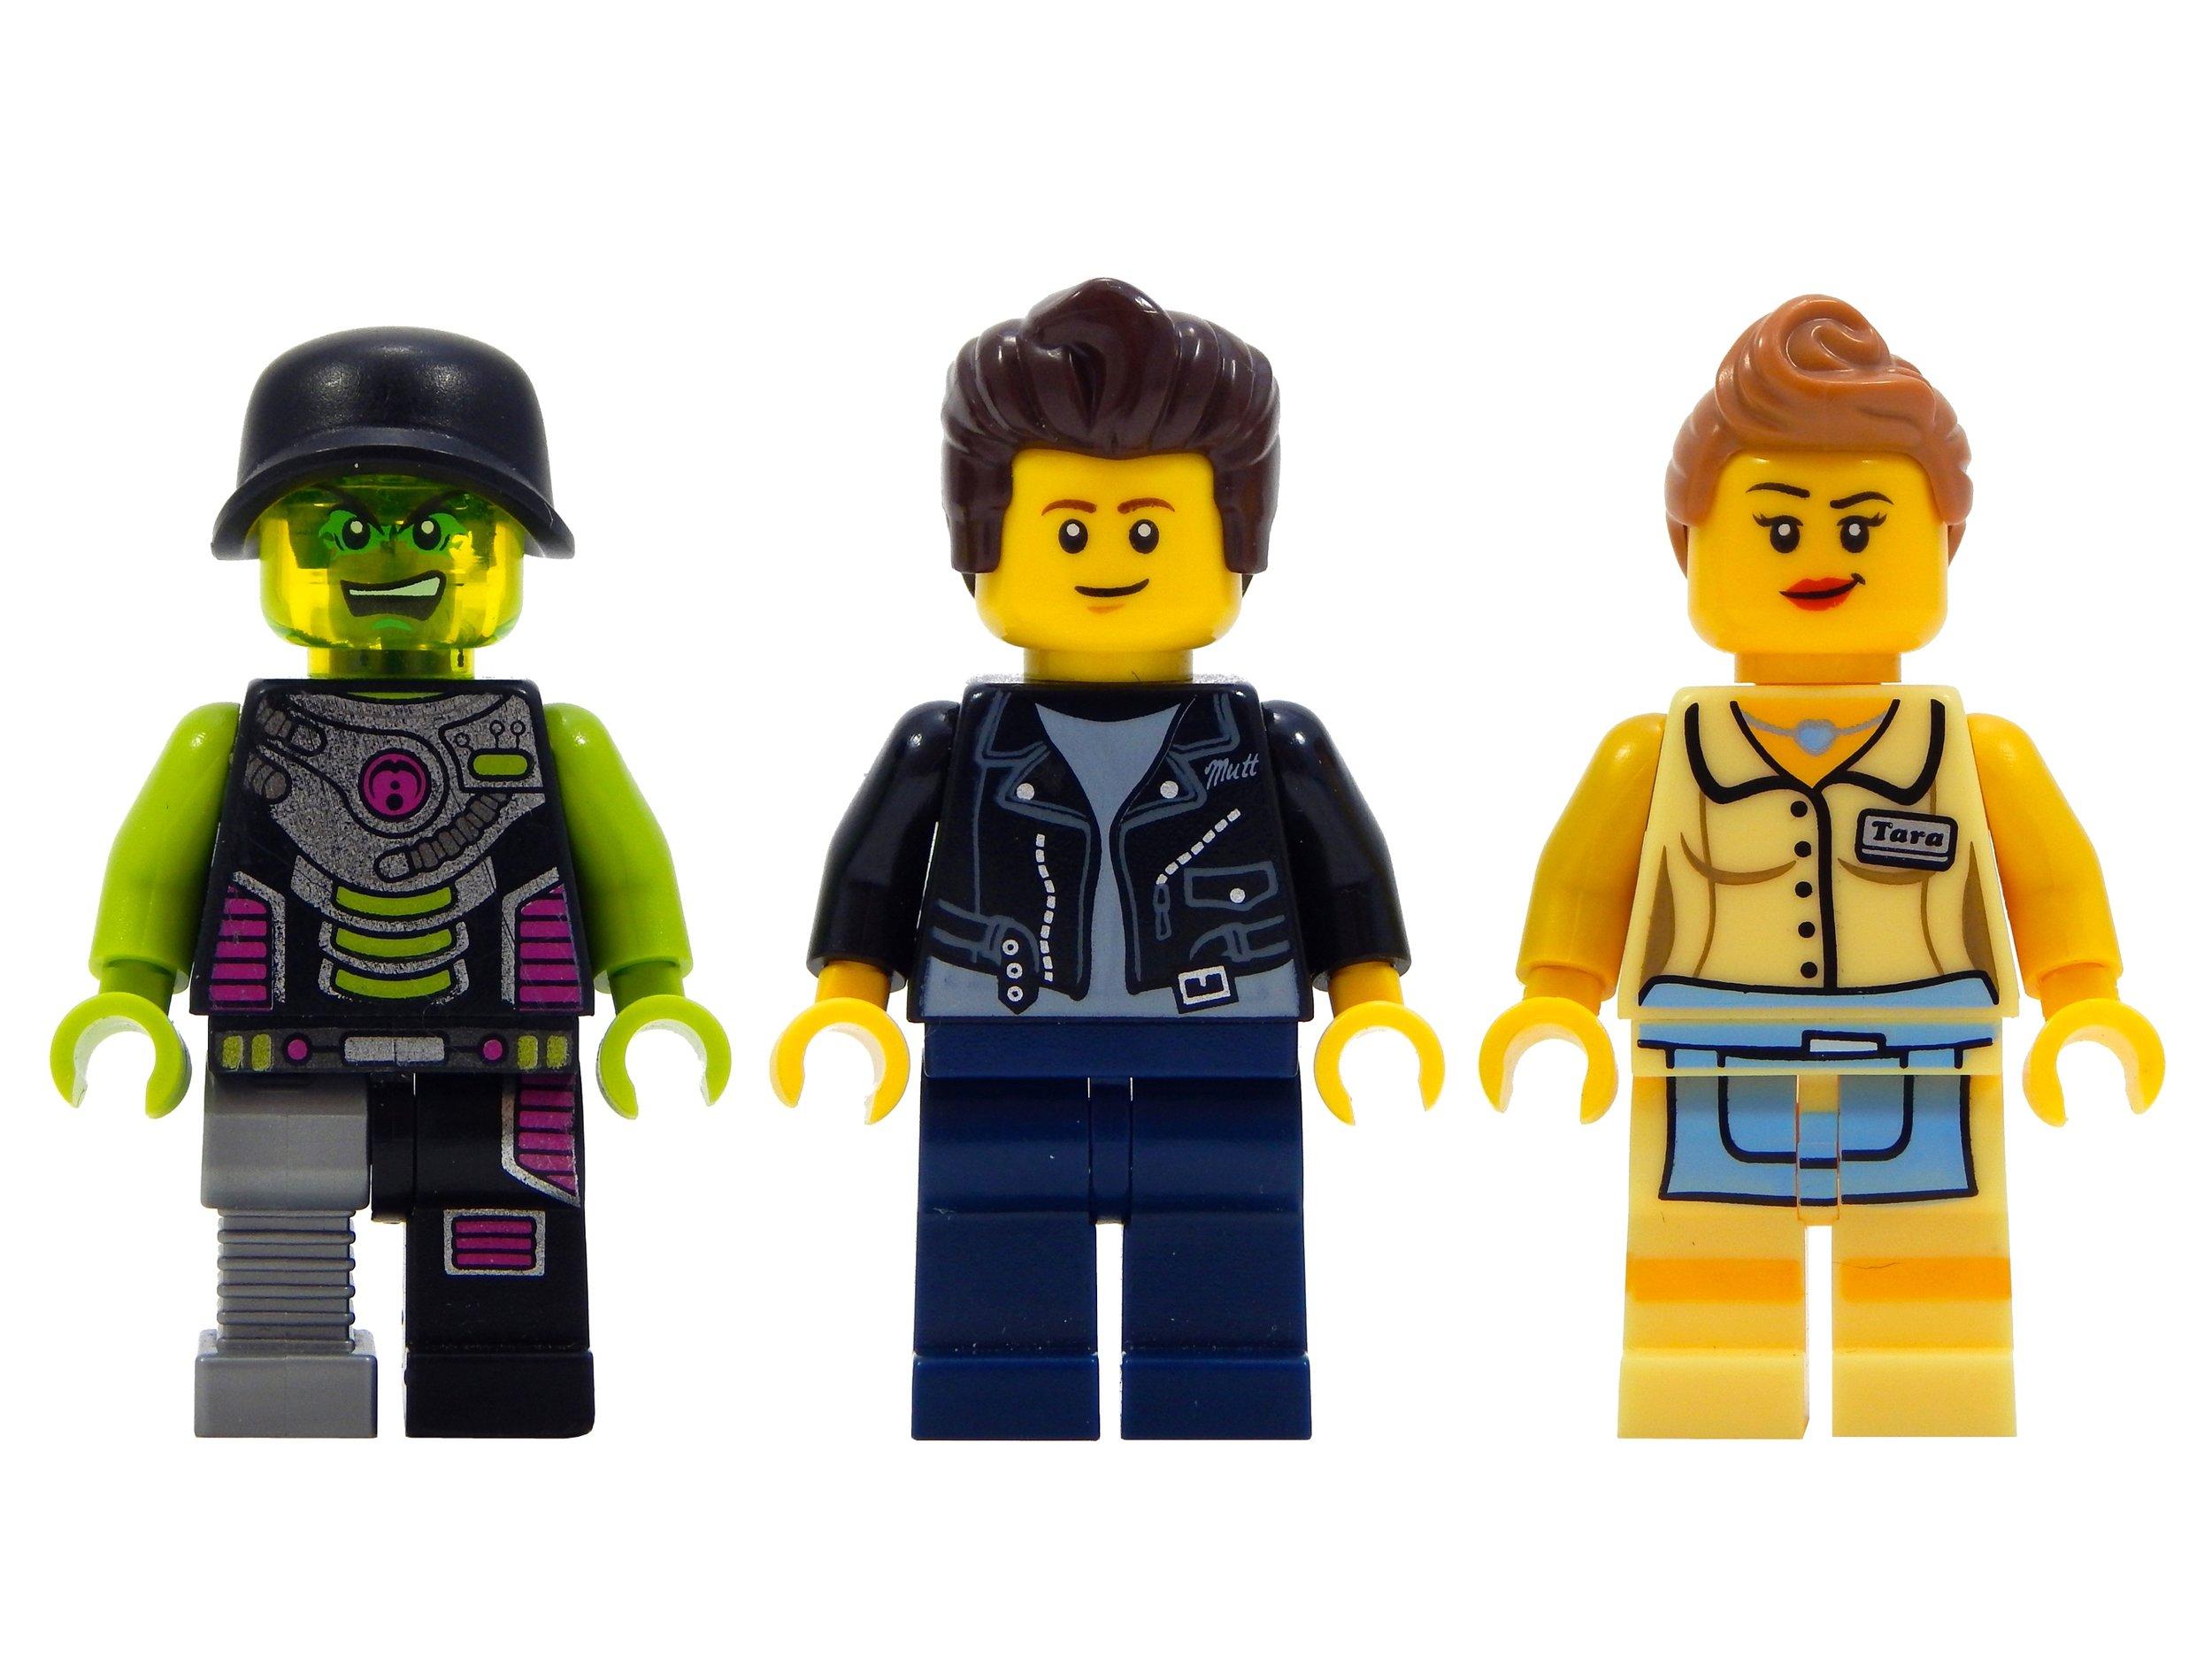 52014 Minifigures.jpg